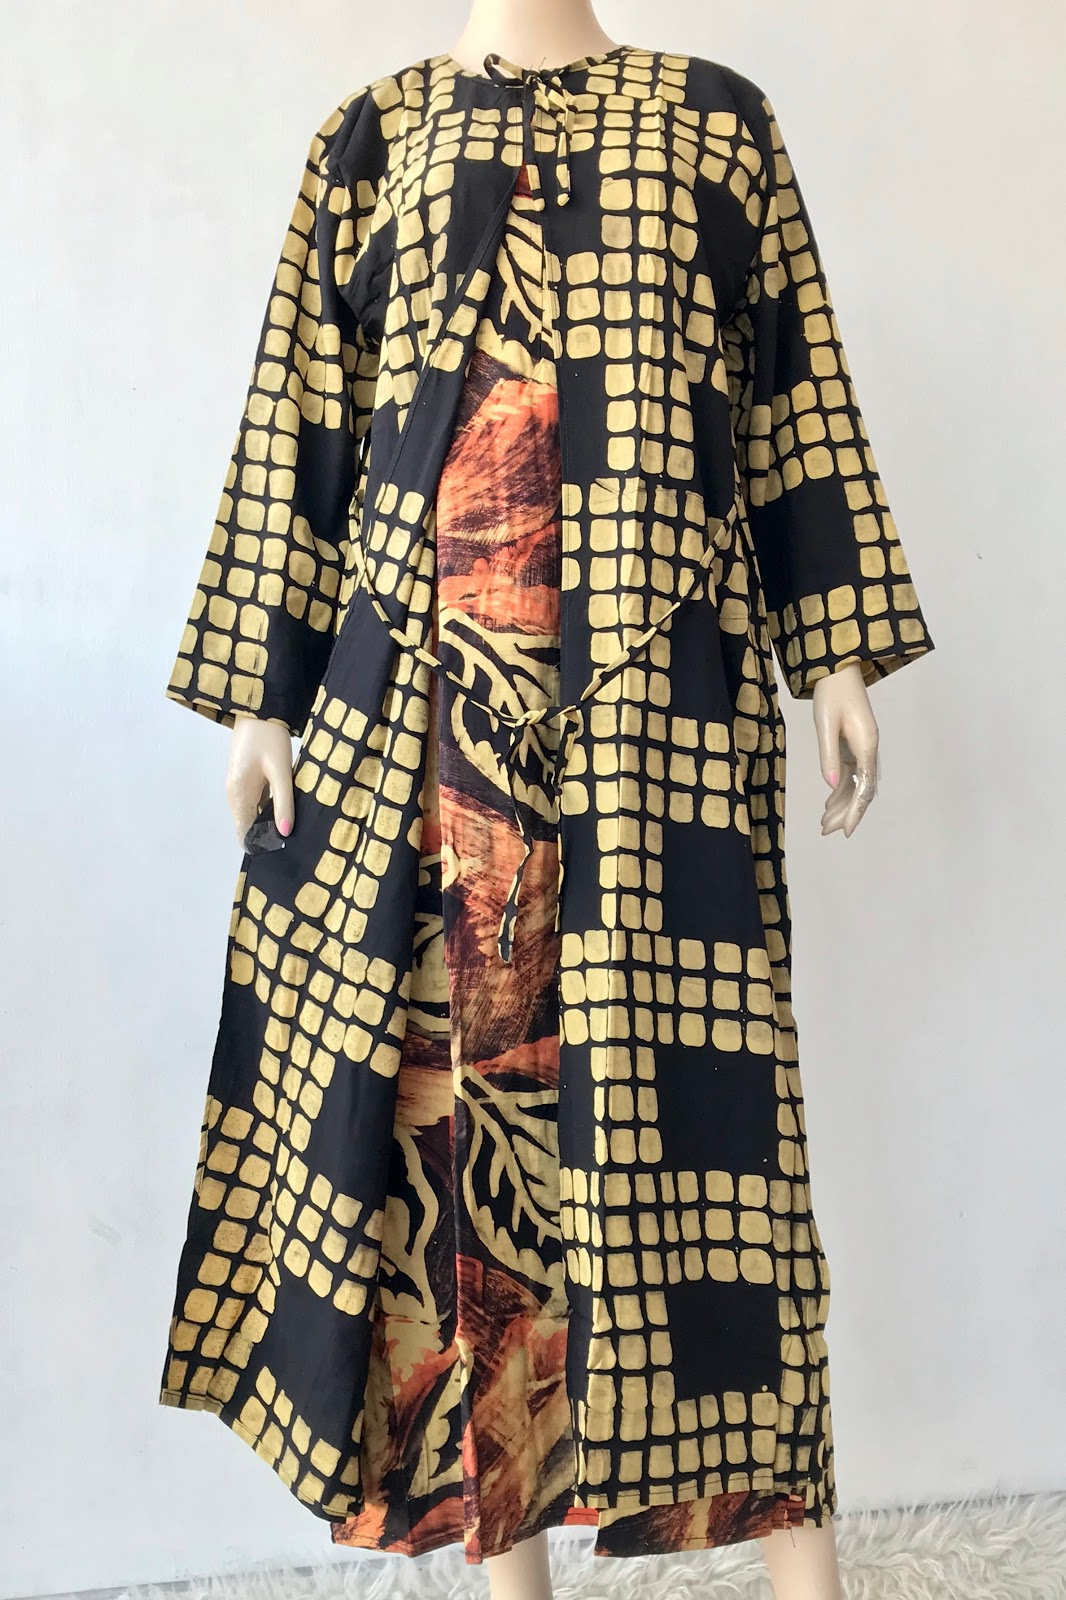 Batik Mayon Daster Lengan Panjang Longdress Baju Bolero Kode Ldc 077 Sms Wa 0817277706